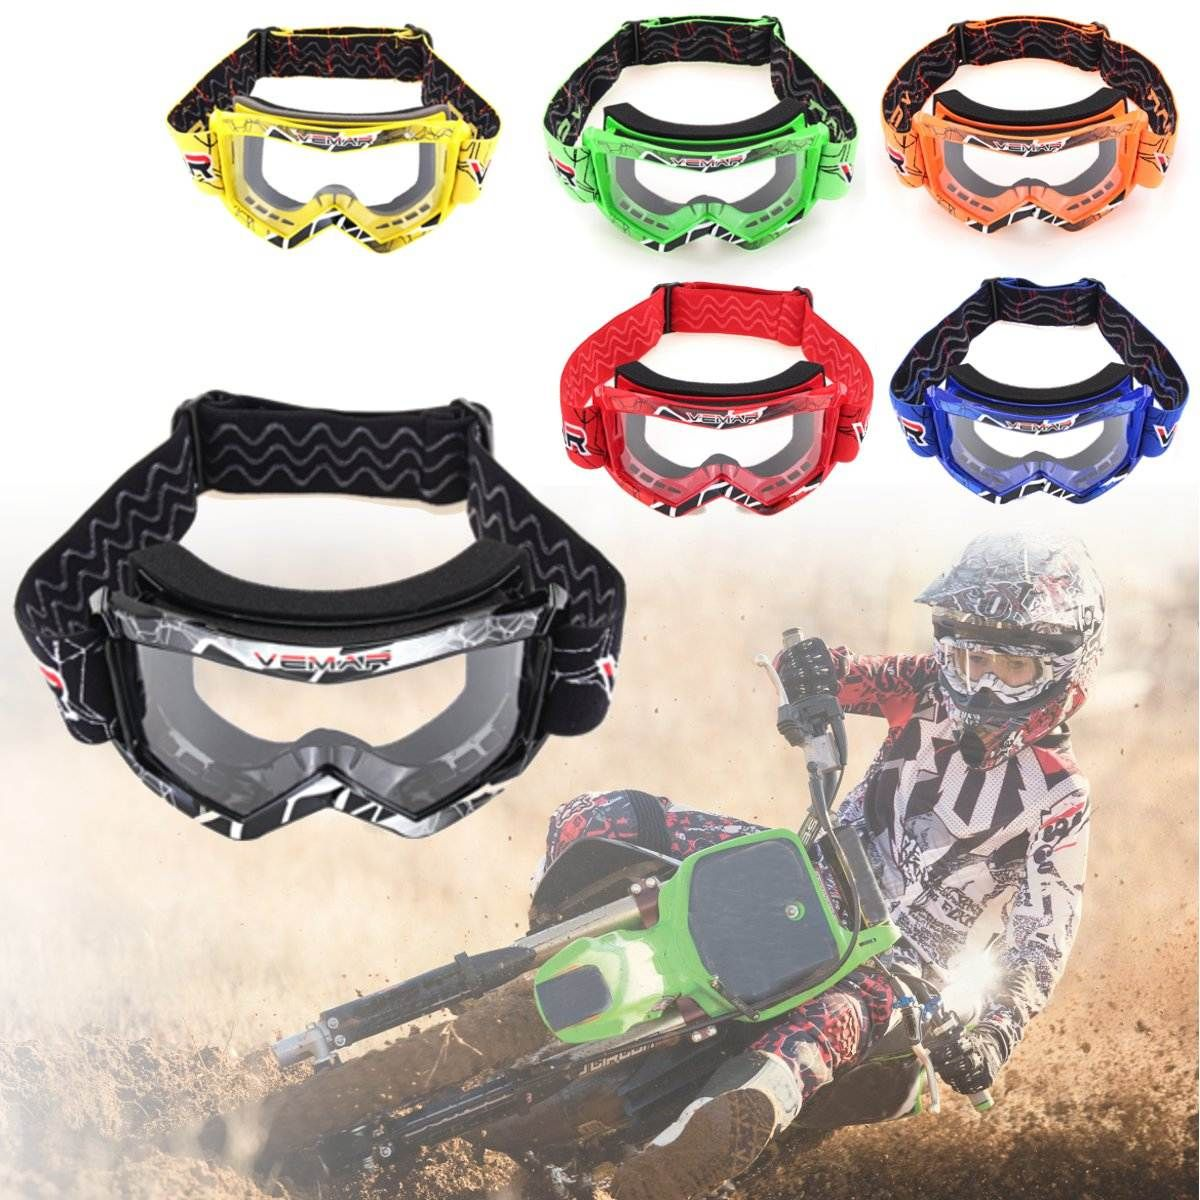 Children Kids Cool Goggles Off Road Motorcycle Motocross Racing Dirt Bike Anti-UV Eyewear New Adjustable Flexible Protect Face